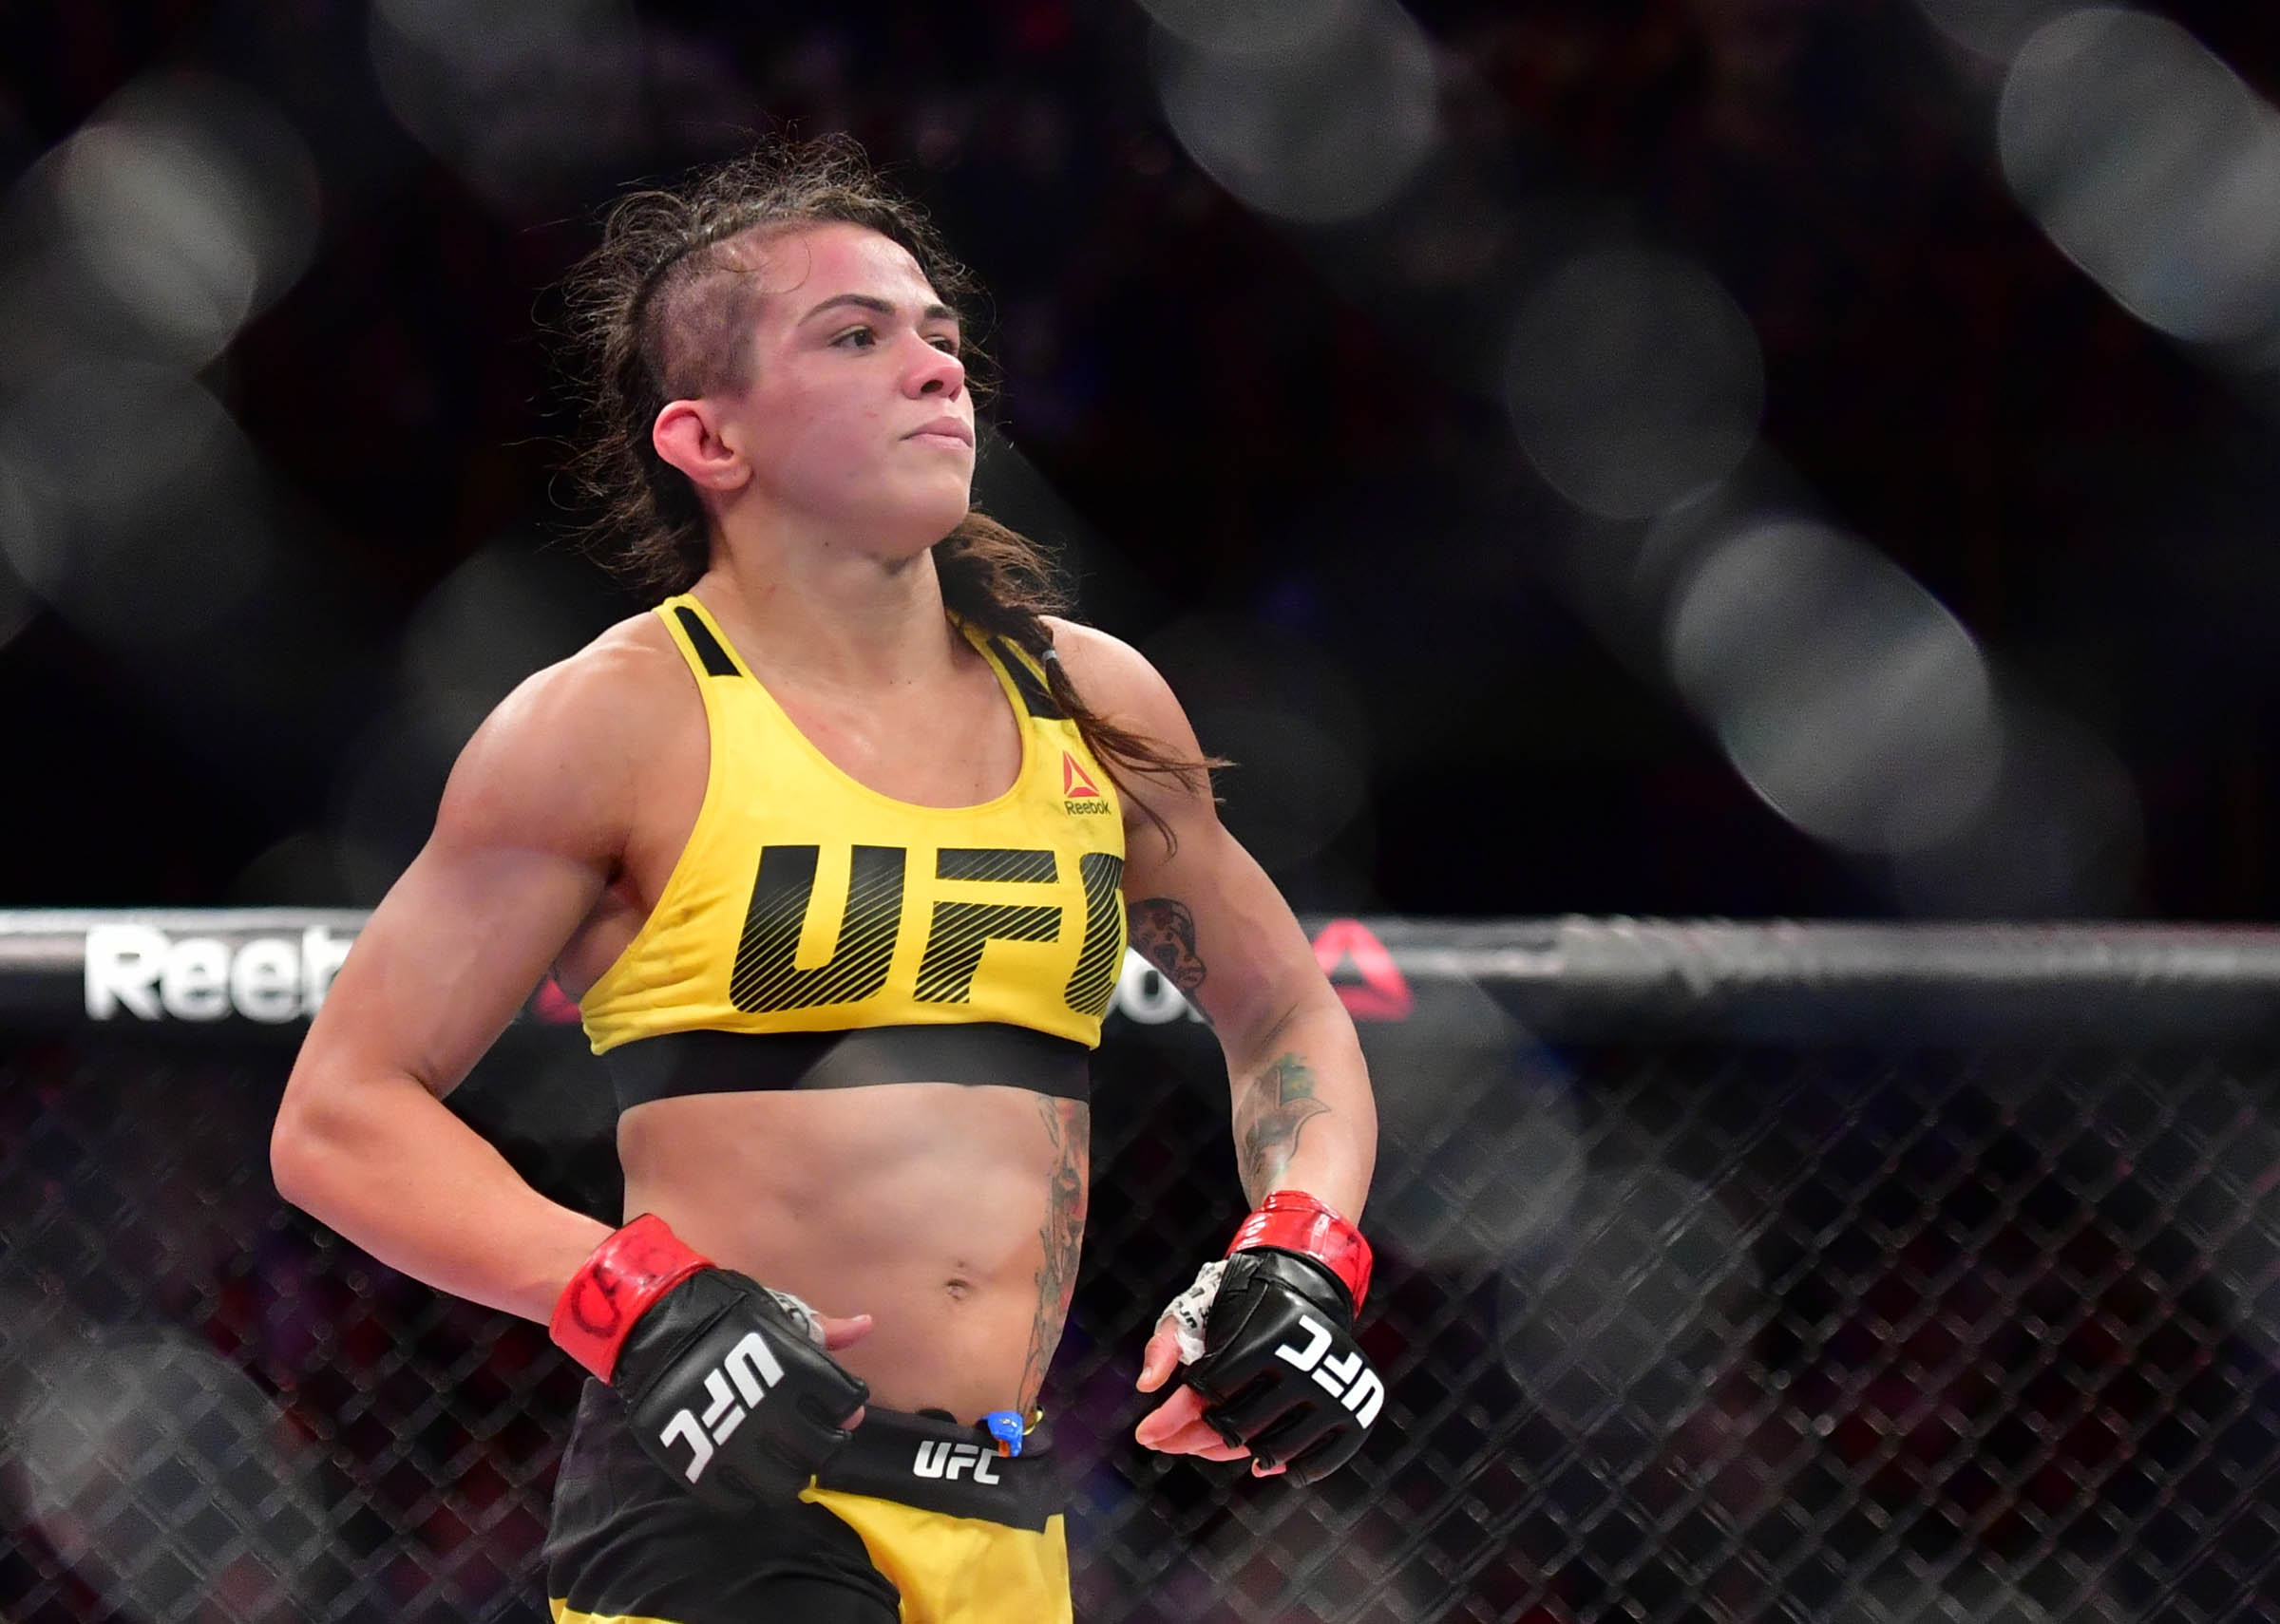 MMA: UFC Fight Night-Gadelha vs Casey